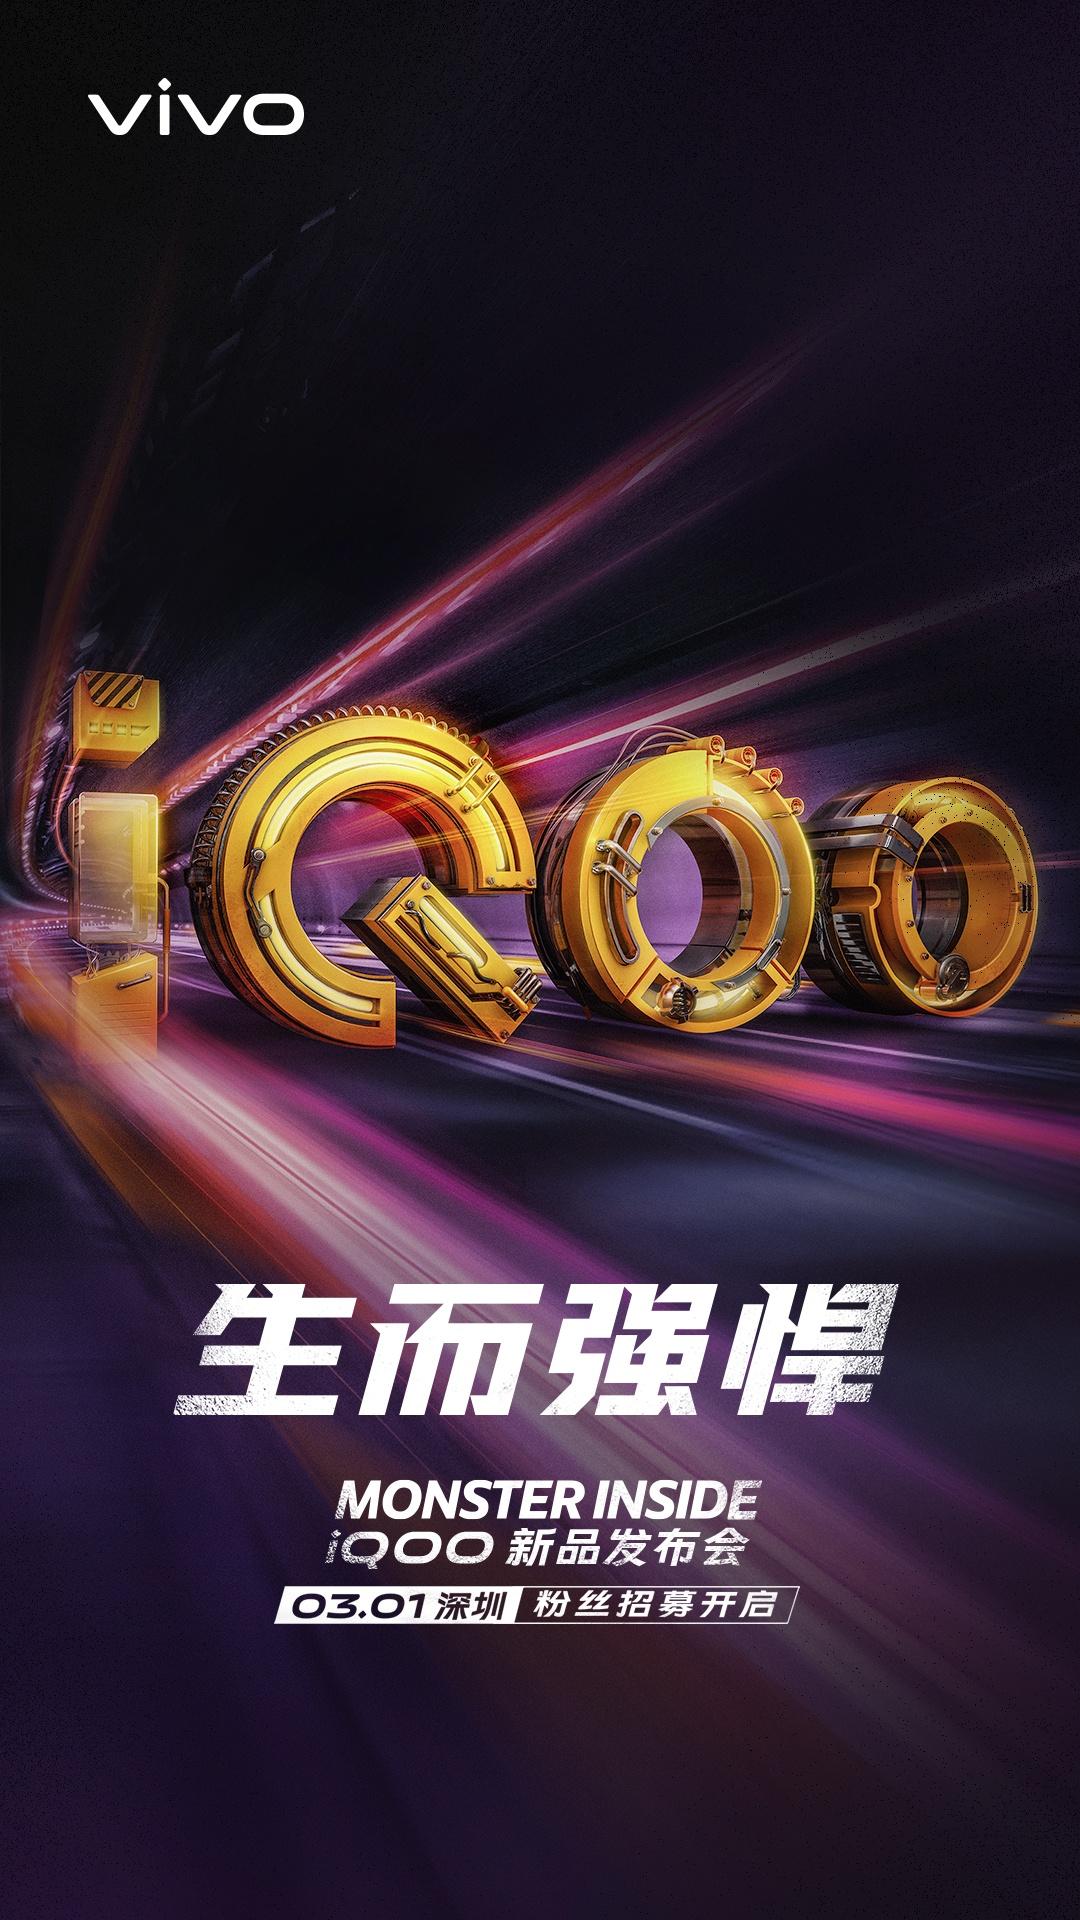 Vivo iQoo Launch Poster